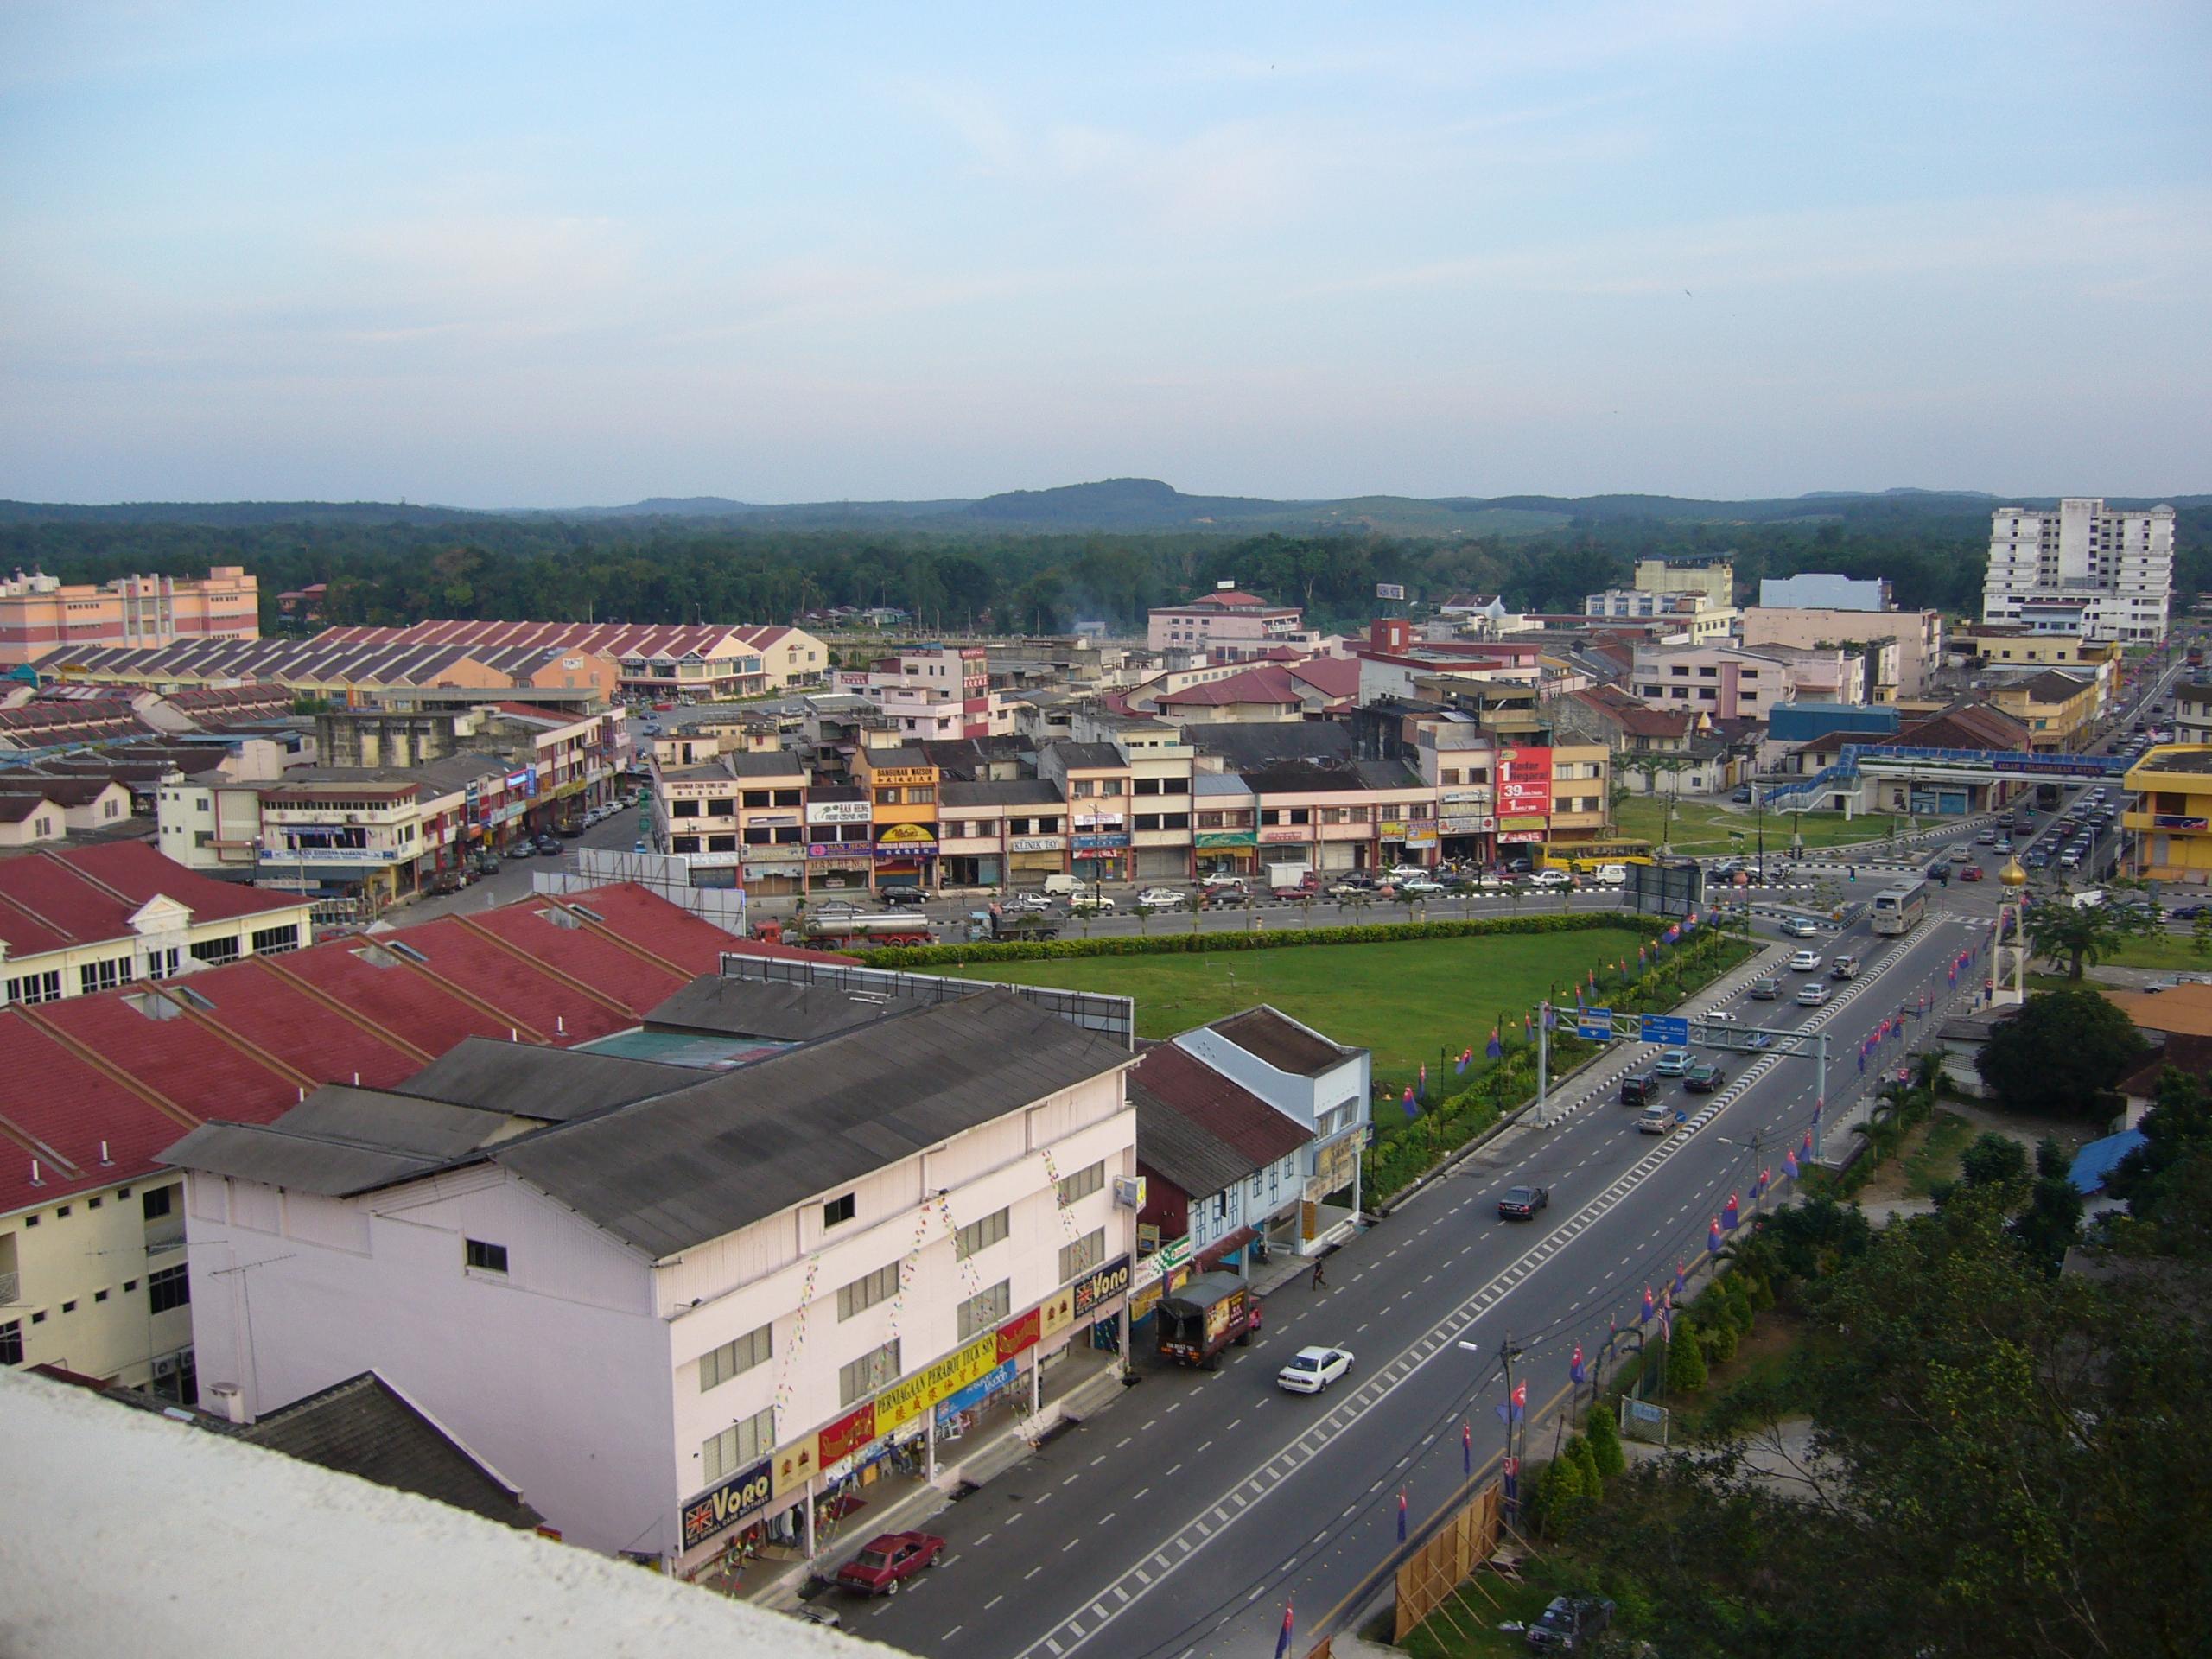 Kota Tinggi Malaysia  city photos gallery : ... free use //commons.wikimedia.org/wiki/ Kota Tinggi Town